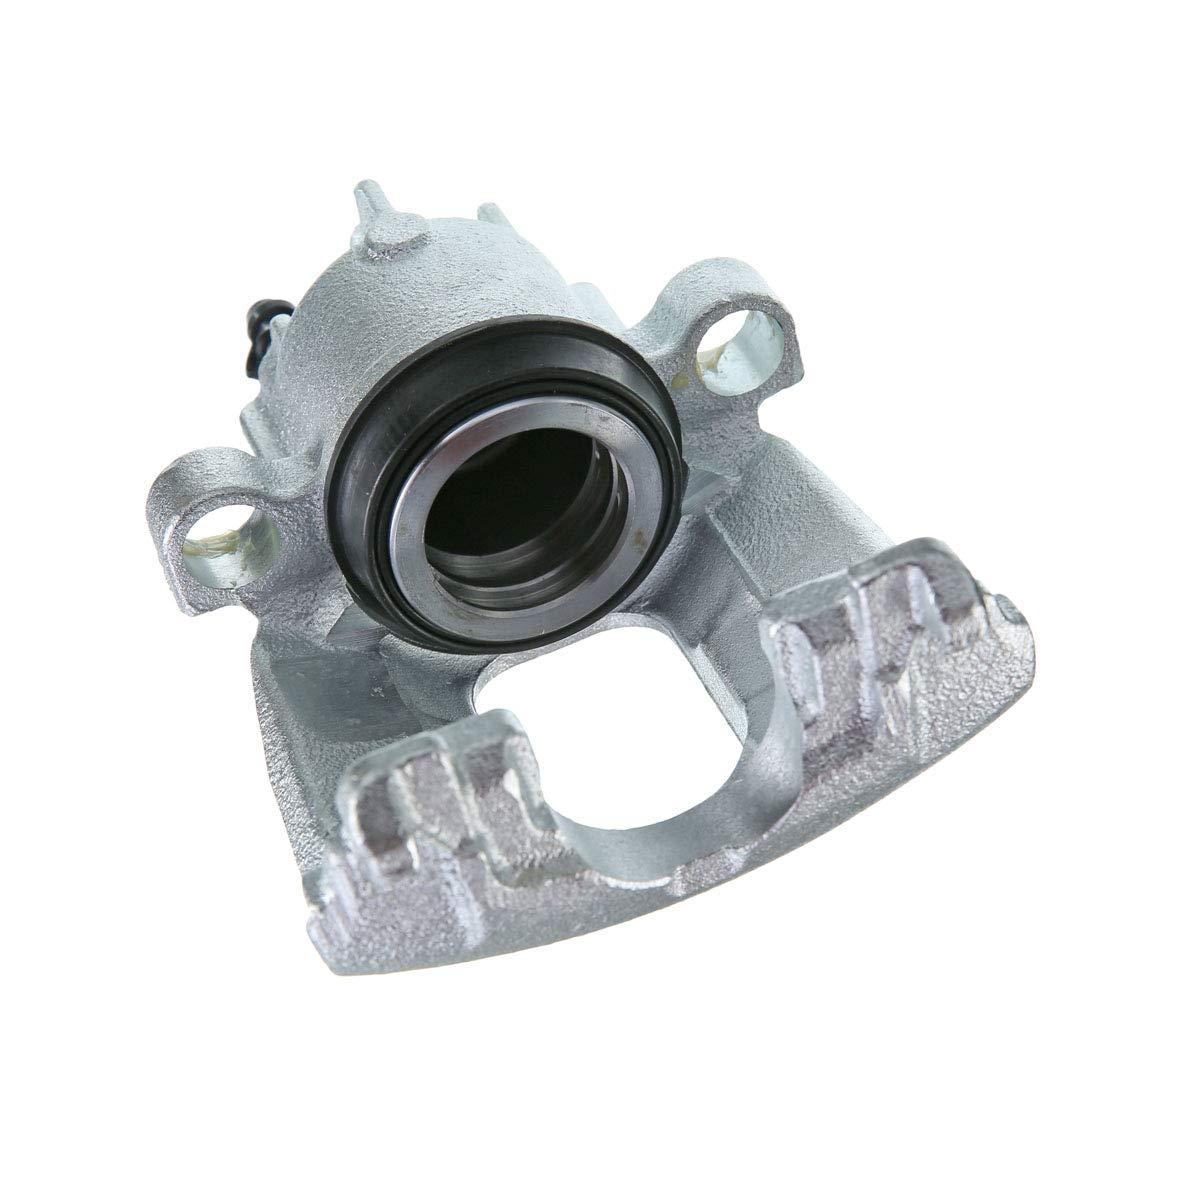 Bremssattel Bremszange Vorderachse Links f/ür Focus DAW DBW DFW DNW 1.4L I4 1.6L 1.8L 2.0L 1998-2004 1075789